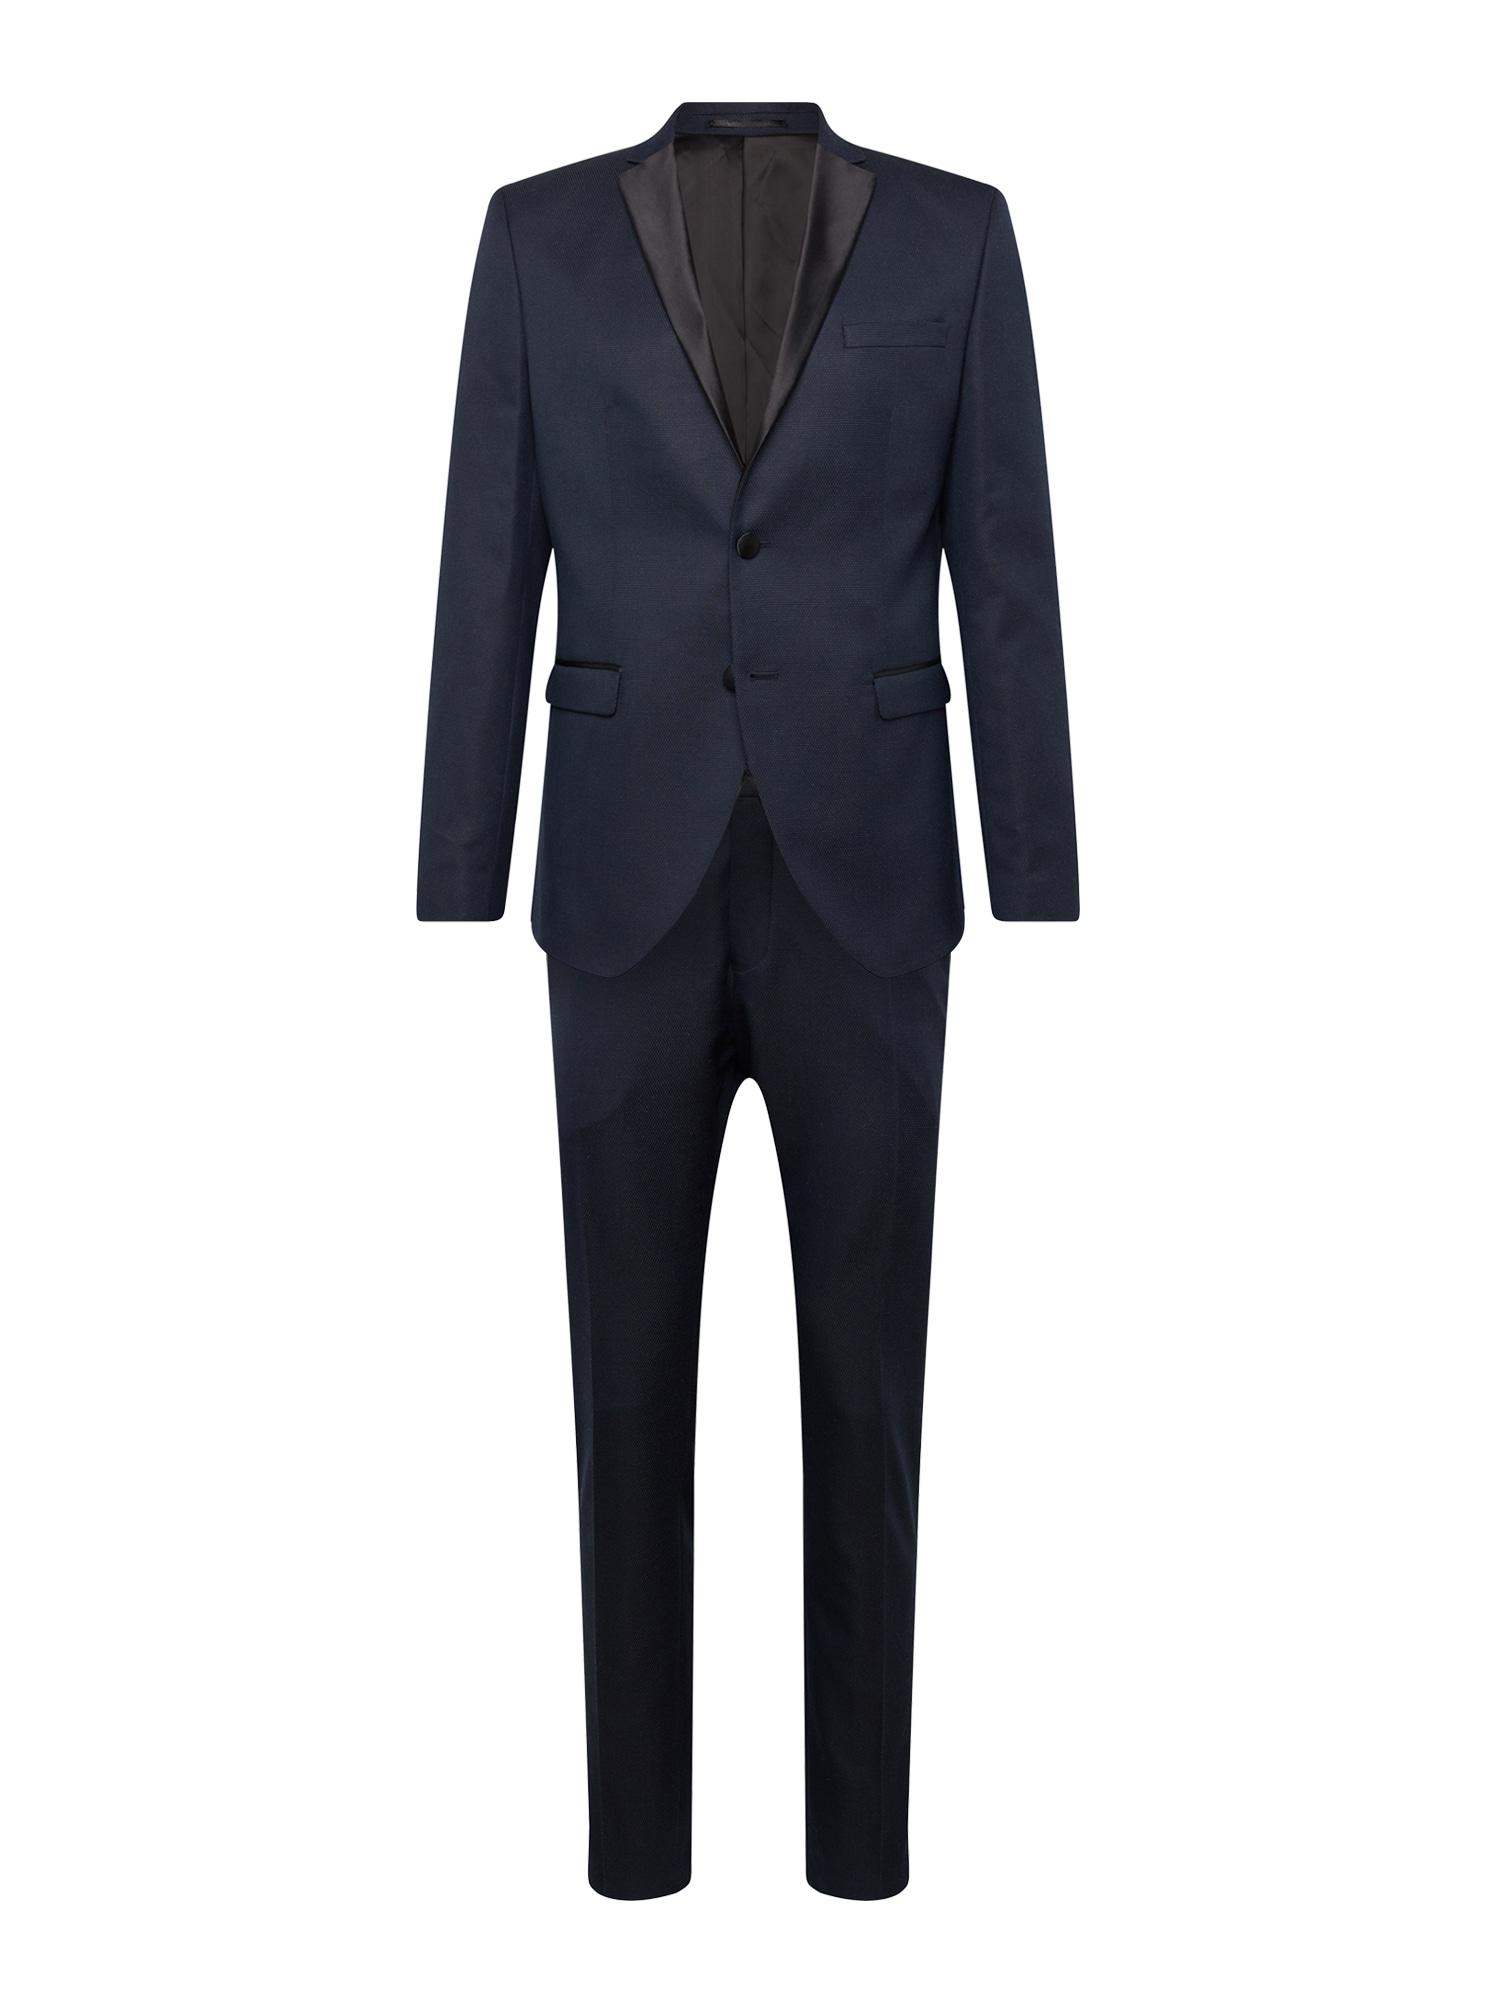 Oblek SLHSLIM-RYANLOGAN NAVY STRUC TUX SUIT B námořnická modř SELECTED HOMME